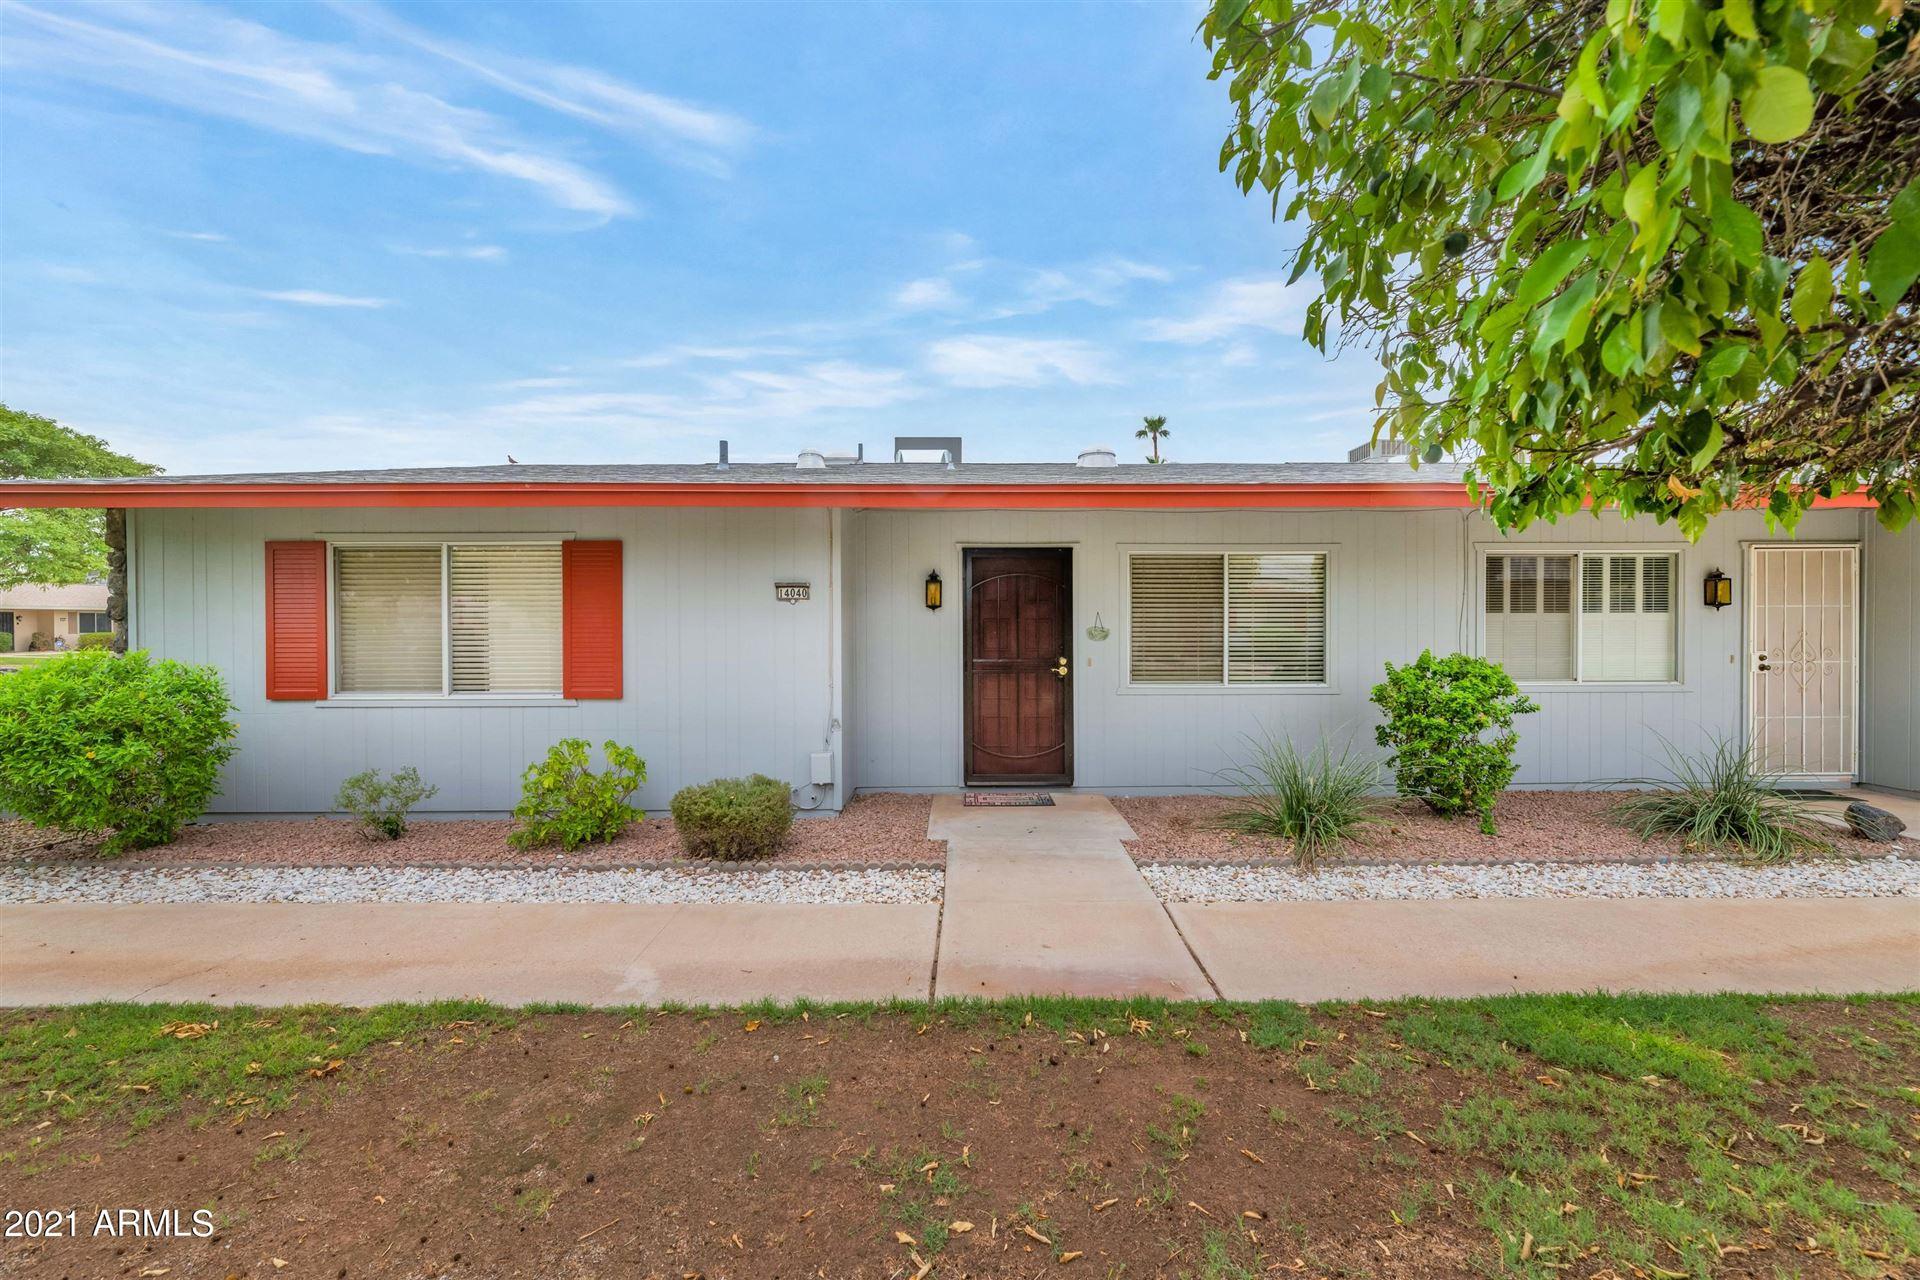 Photo of 14040 N NEWCASTLE Drive, Sun City, AZ 85351 (MLS # 6269026)